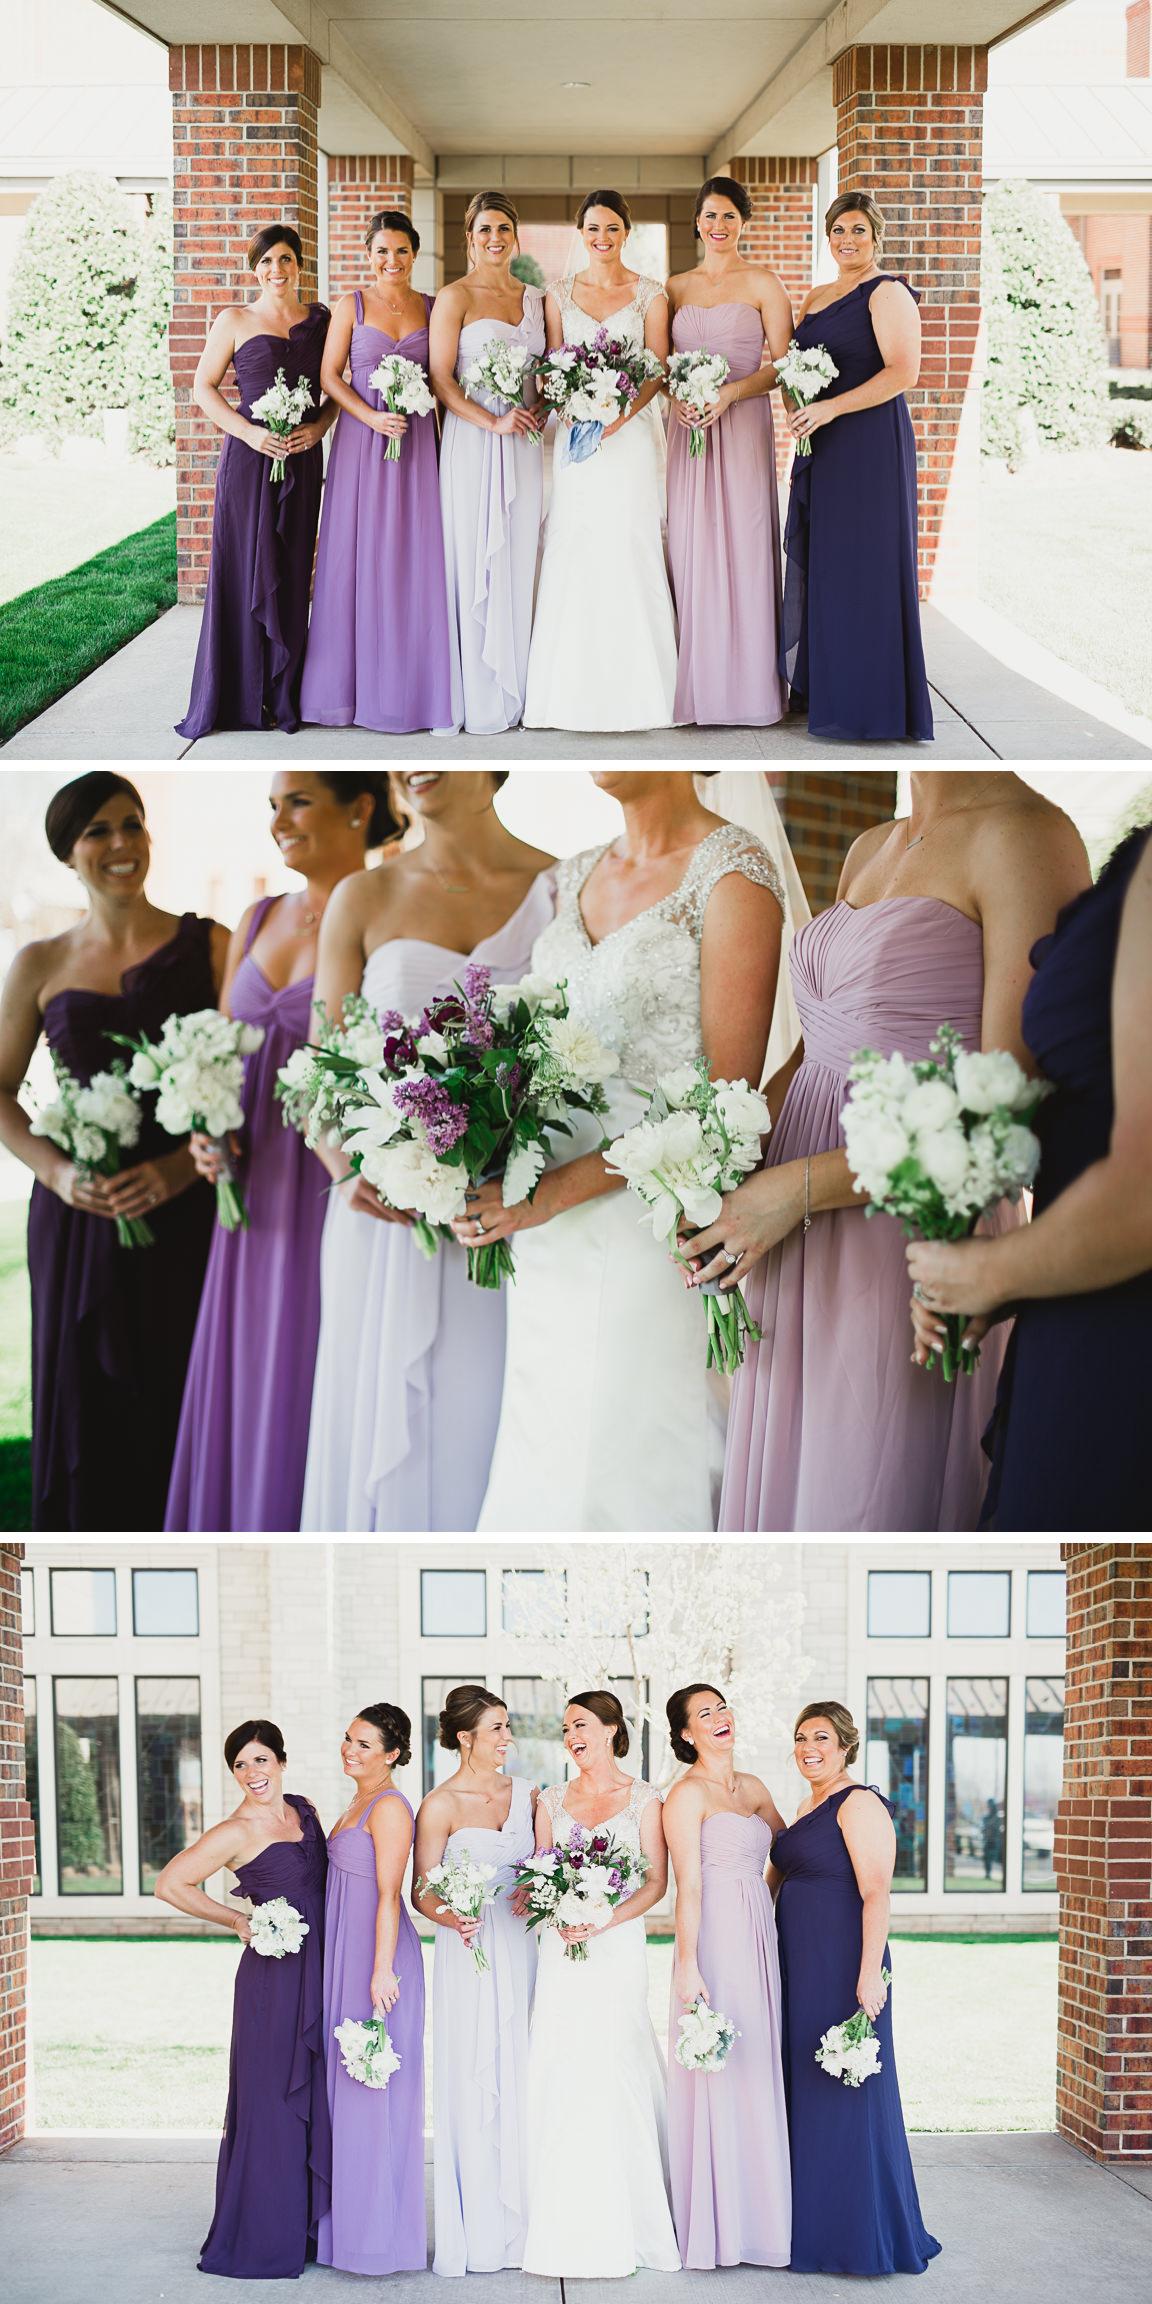 9 bridesmaids ombre purple dresses okc oklahoma weddings catie 9 bridesmaids ombre purple dresses okc oklahoma weddings ombrellifo Gallery